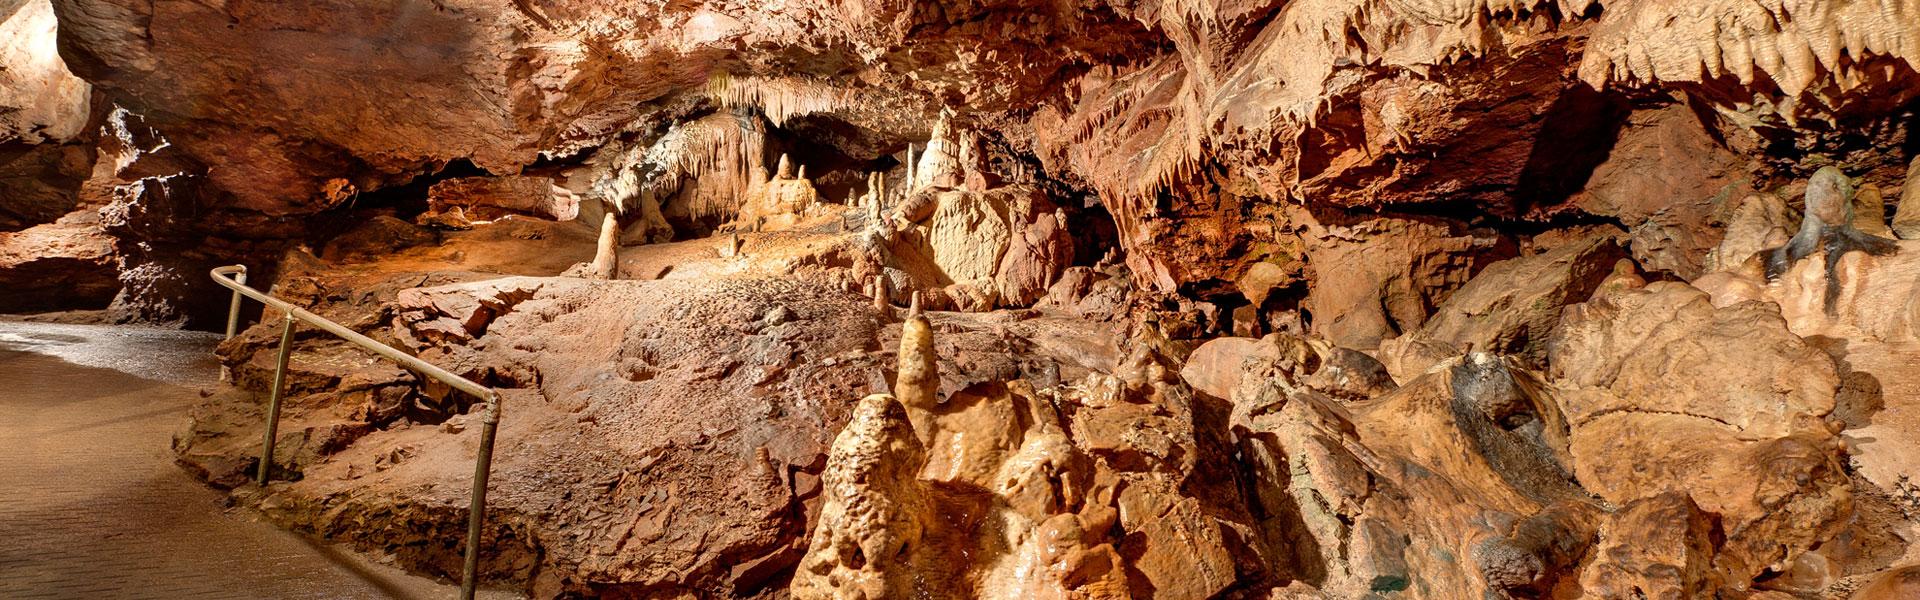 Kents Cavern - Torquay, Devon, England